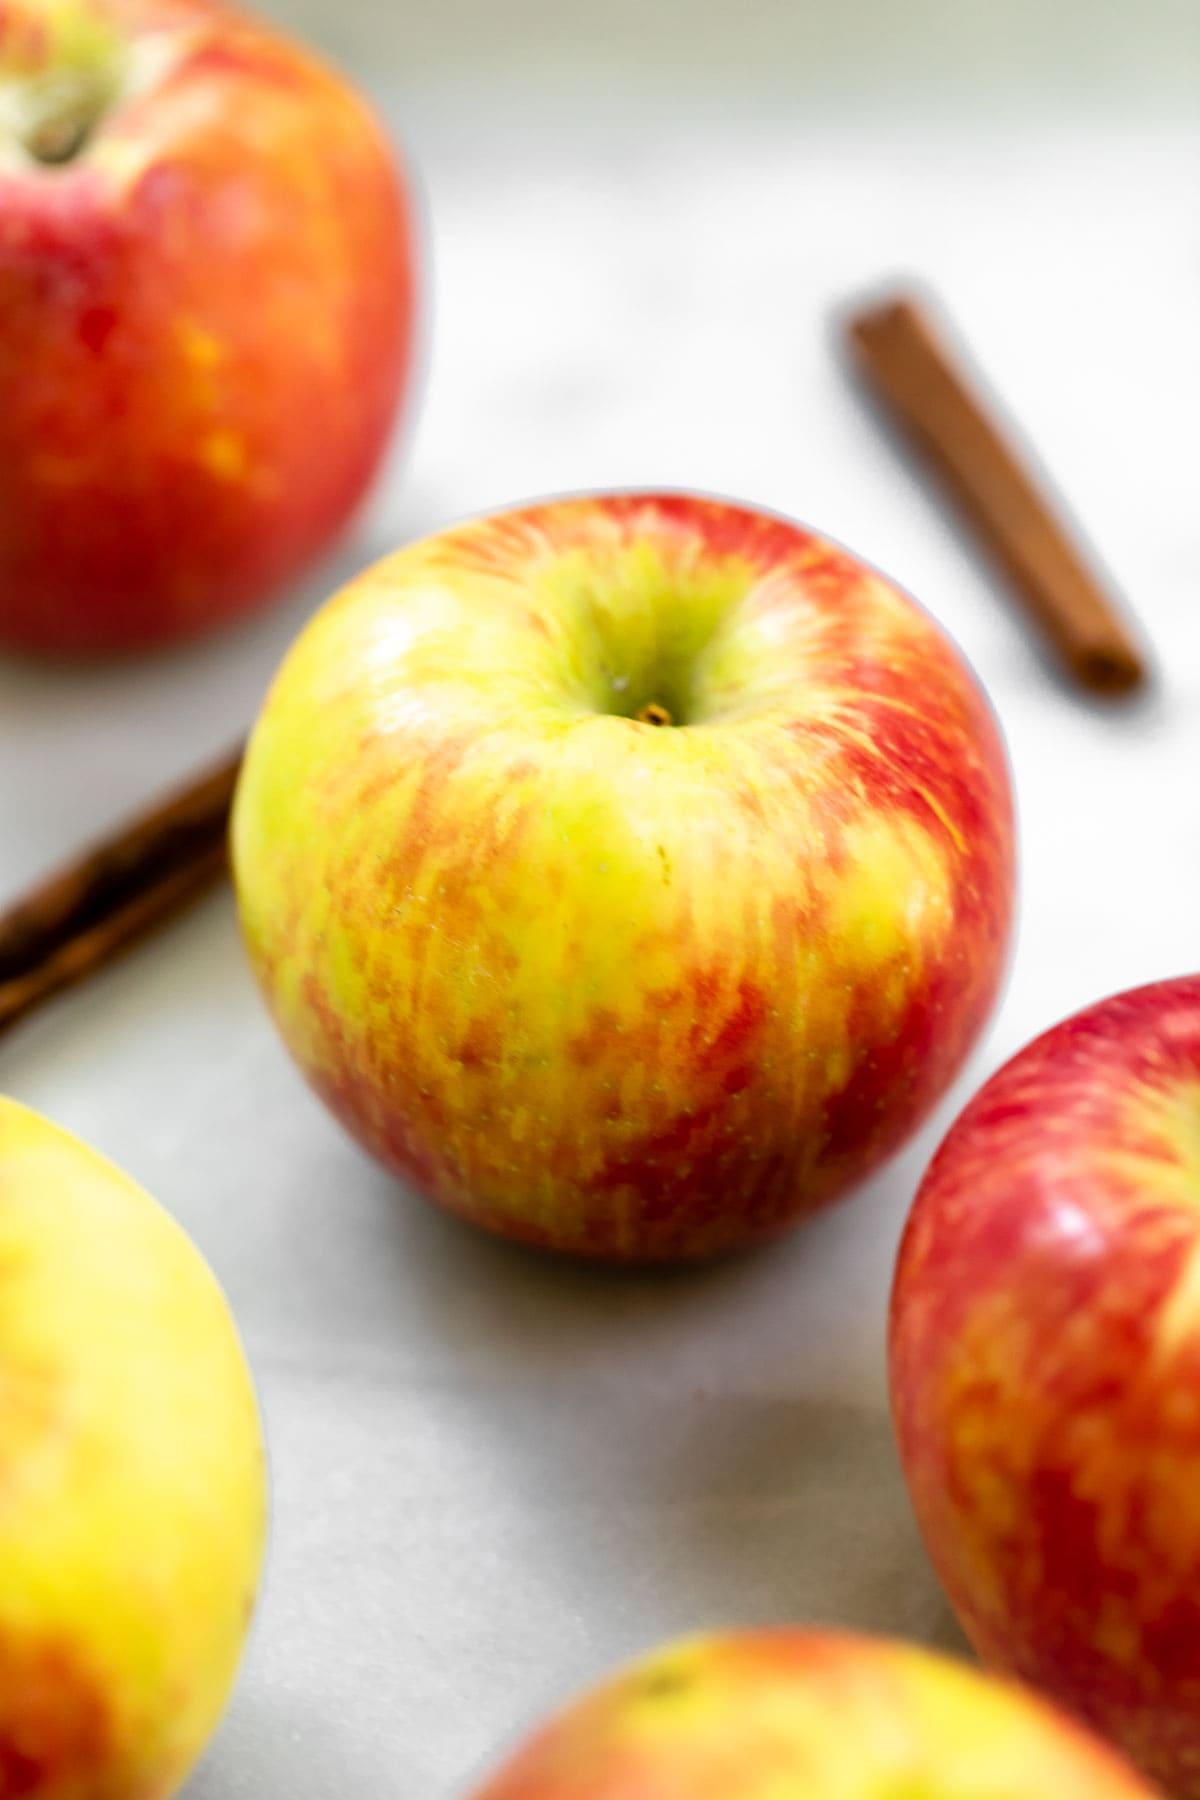 Apples and cinnamon sticks.